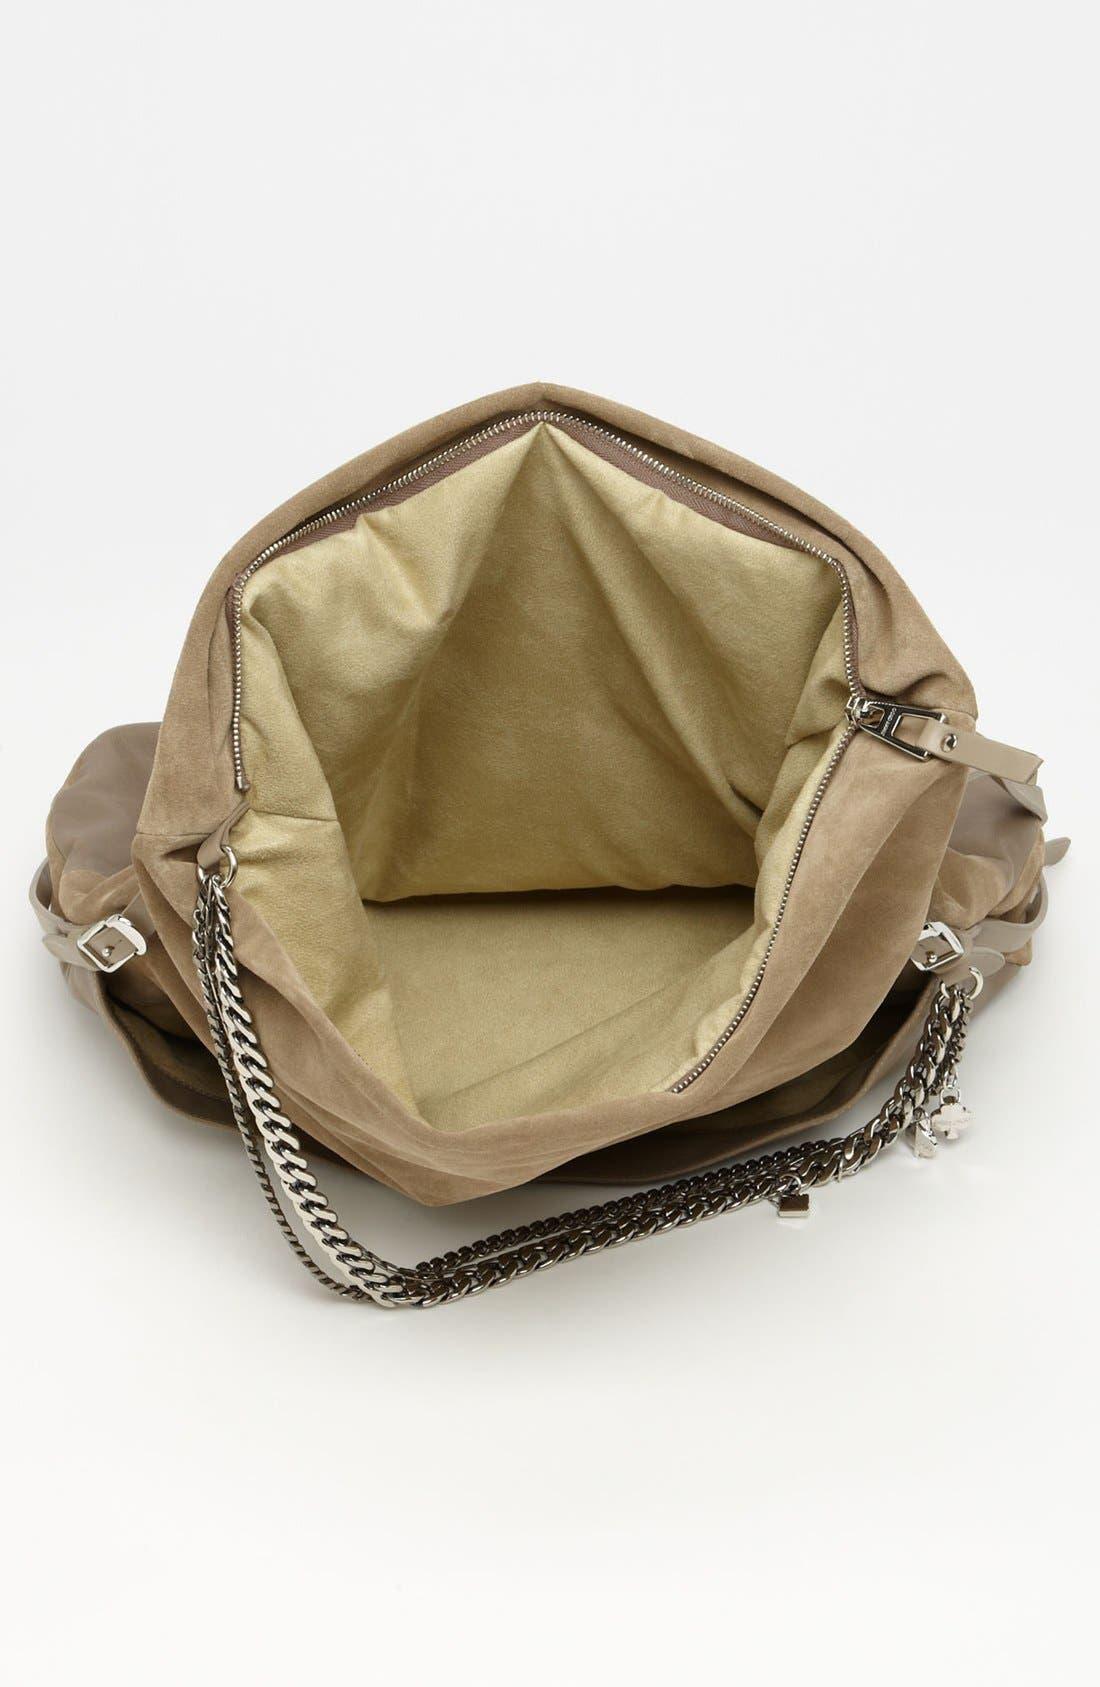 Alternate Image 3  - Jimmy Choo 'Biker - Large' Suede & Leather Crossbody Bag